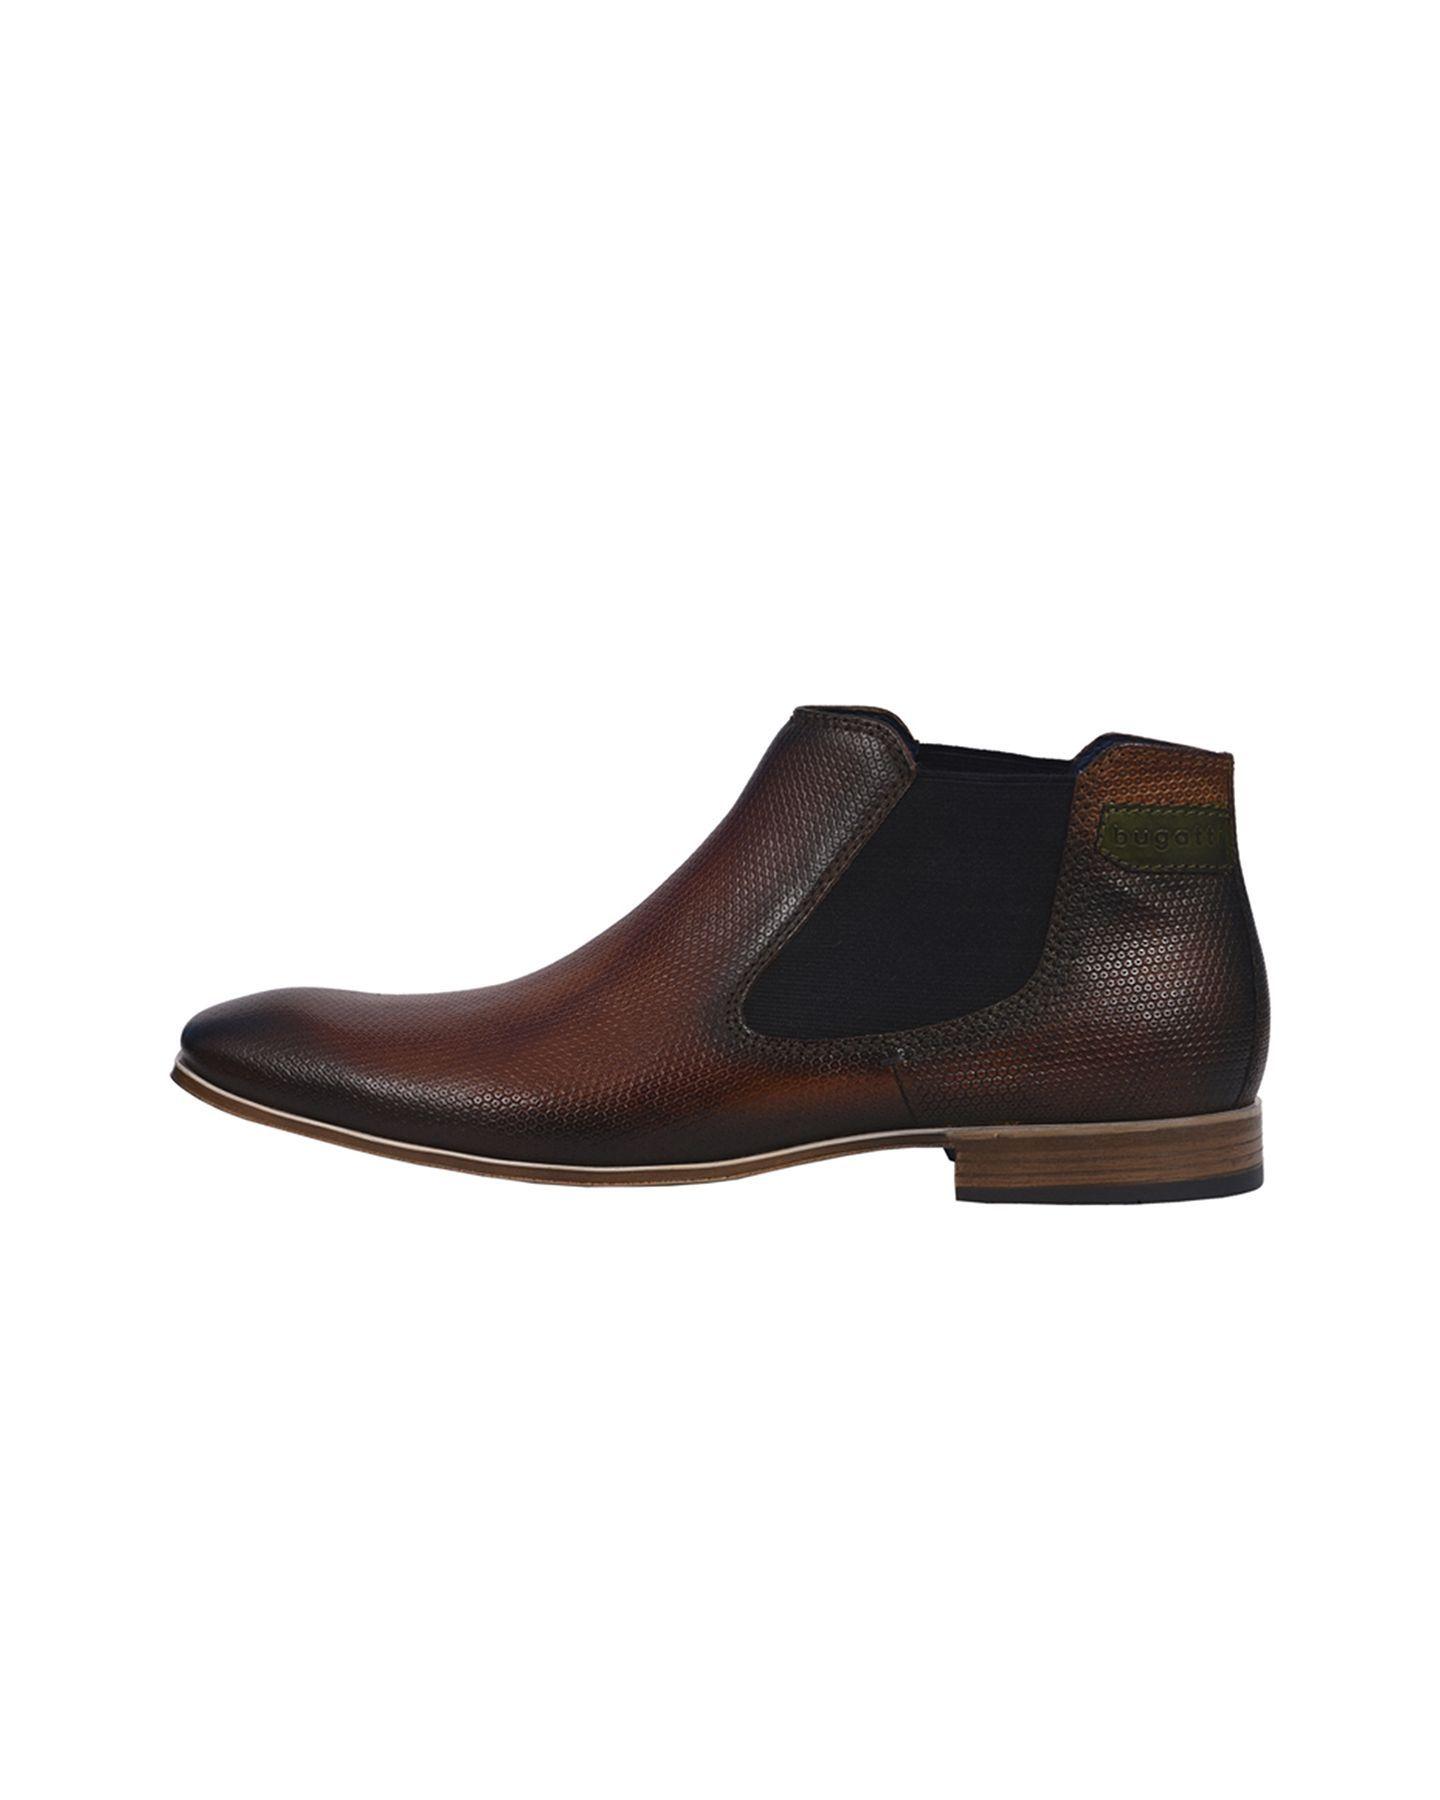 bugatti Chelsea boots in cognac in Größe 41